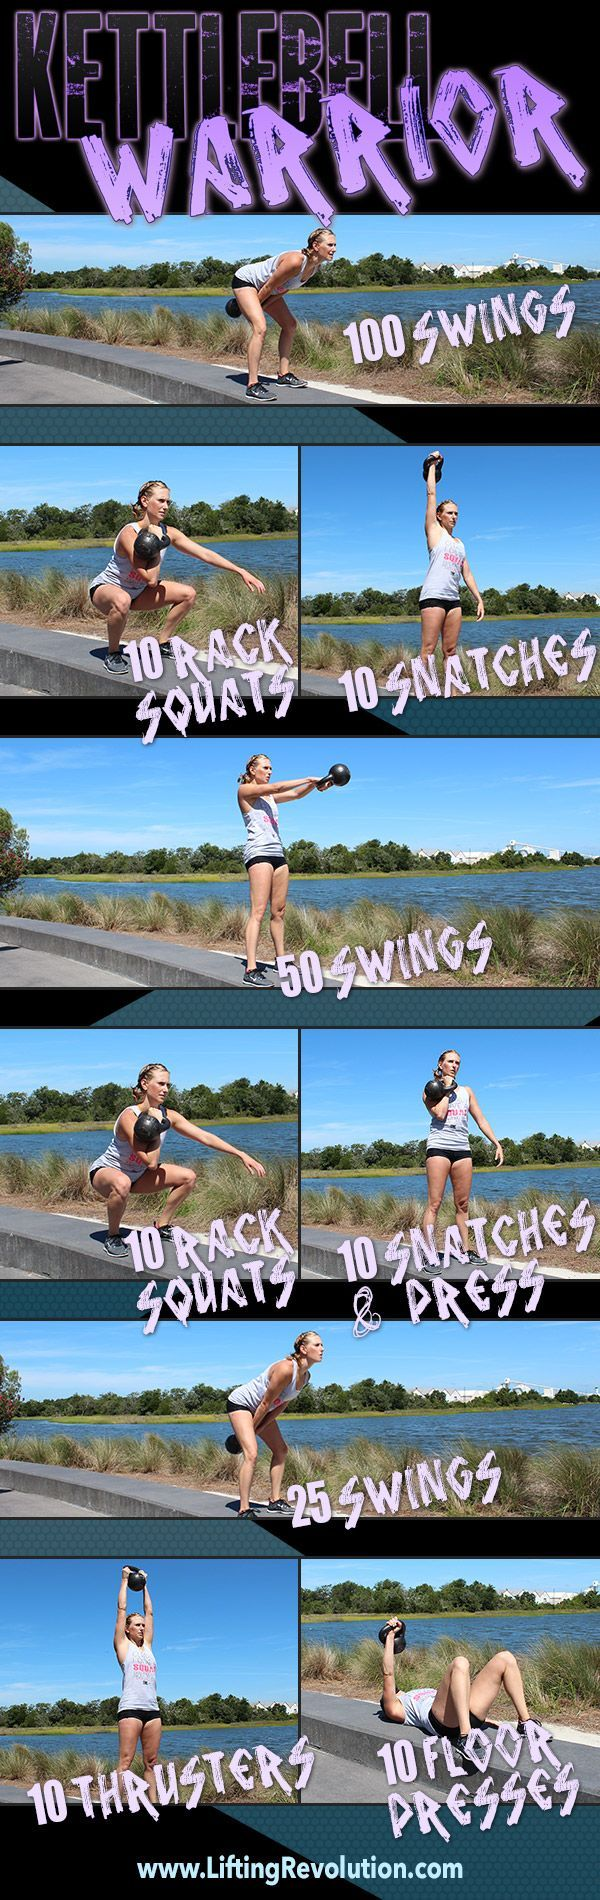 The Kettlebell Warrior Workout #Fitness